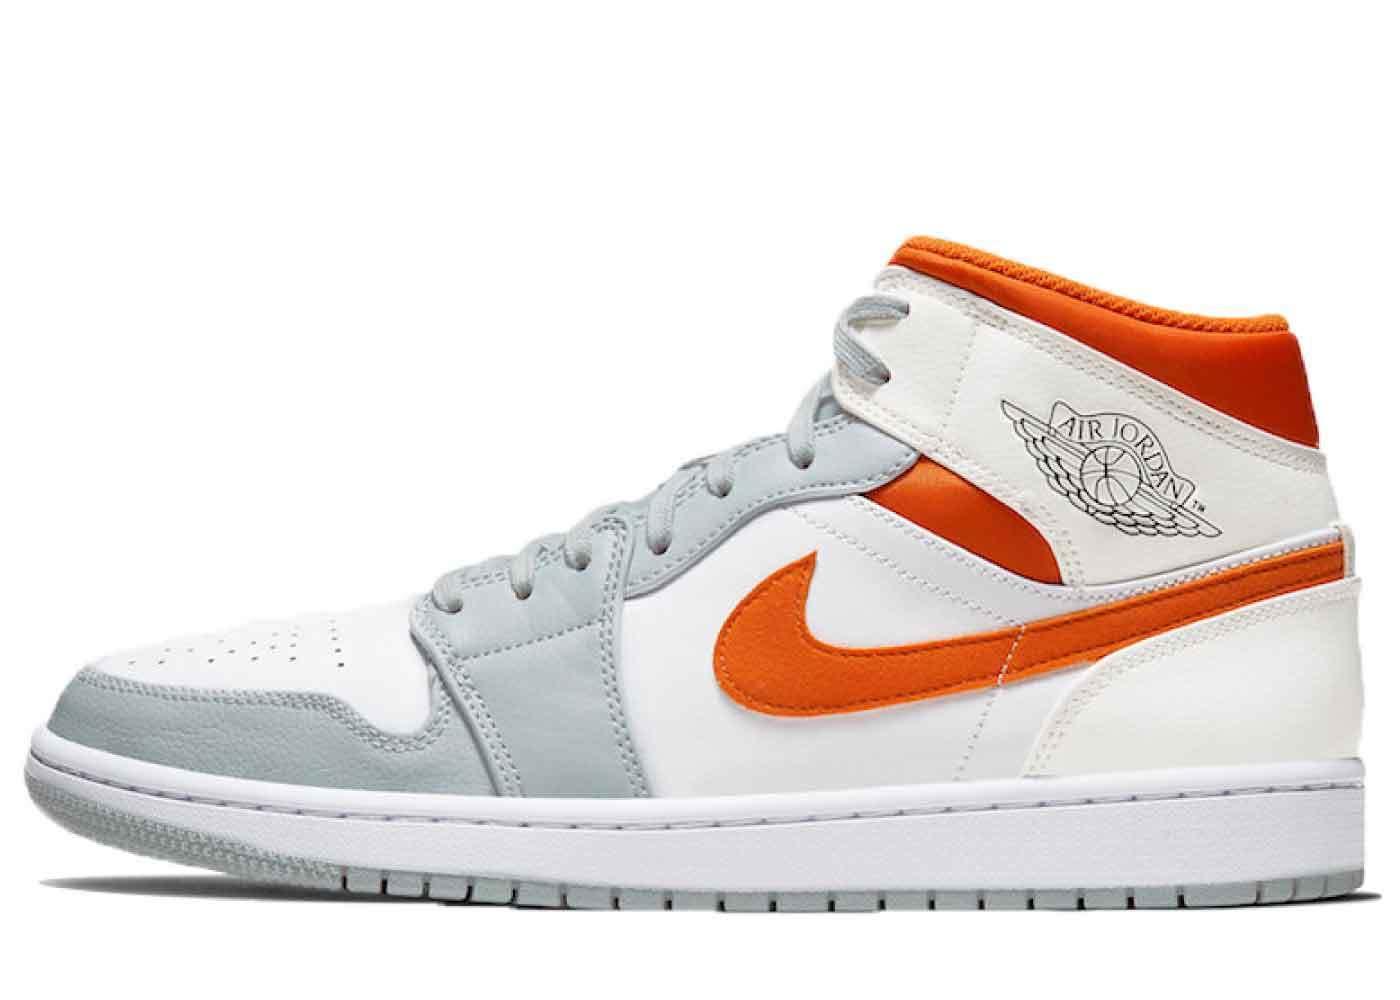 Nike Air Jordan 1 Mid Starfishの写真